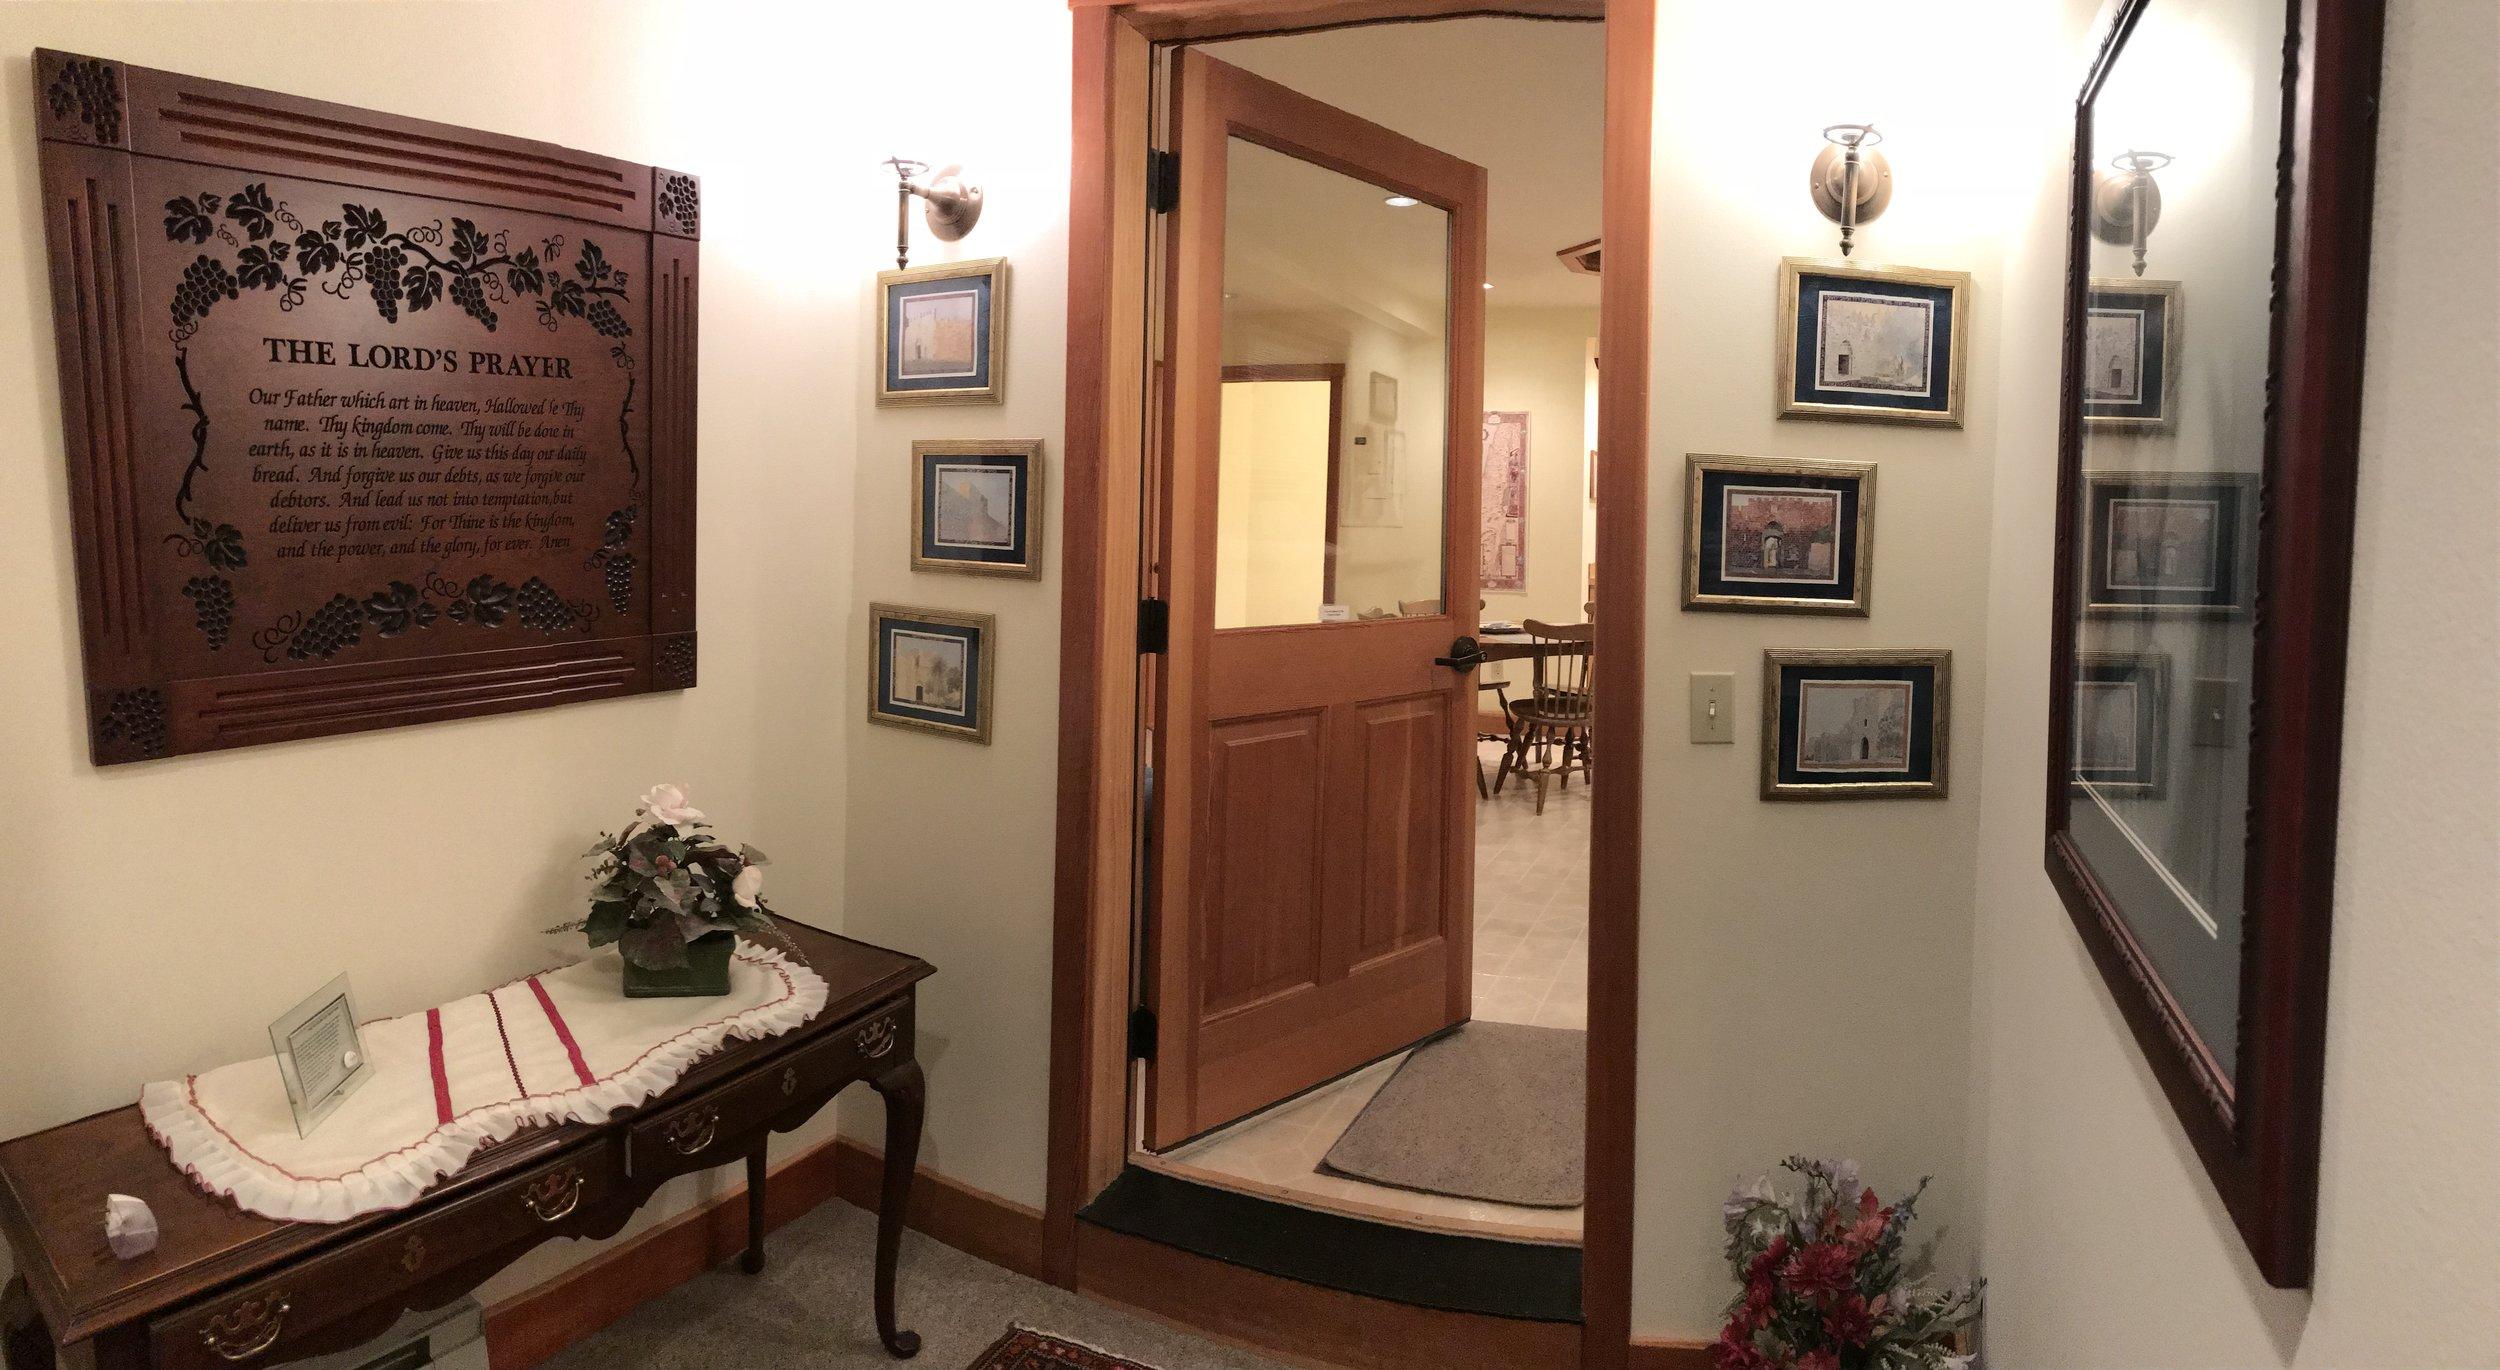 Entryway to the Prayer Center